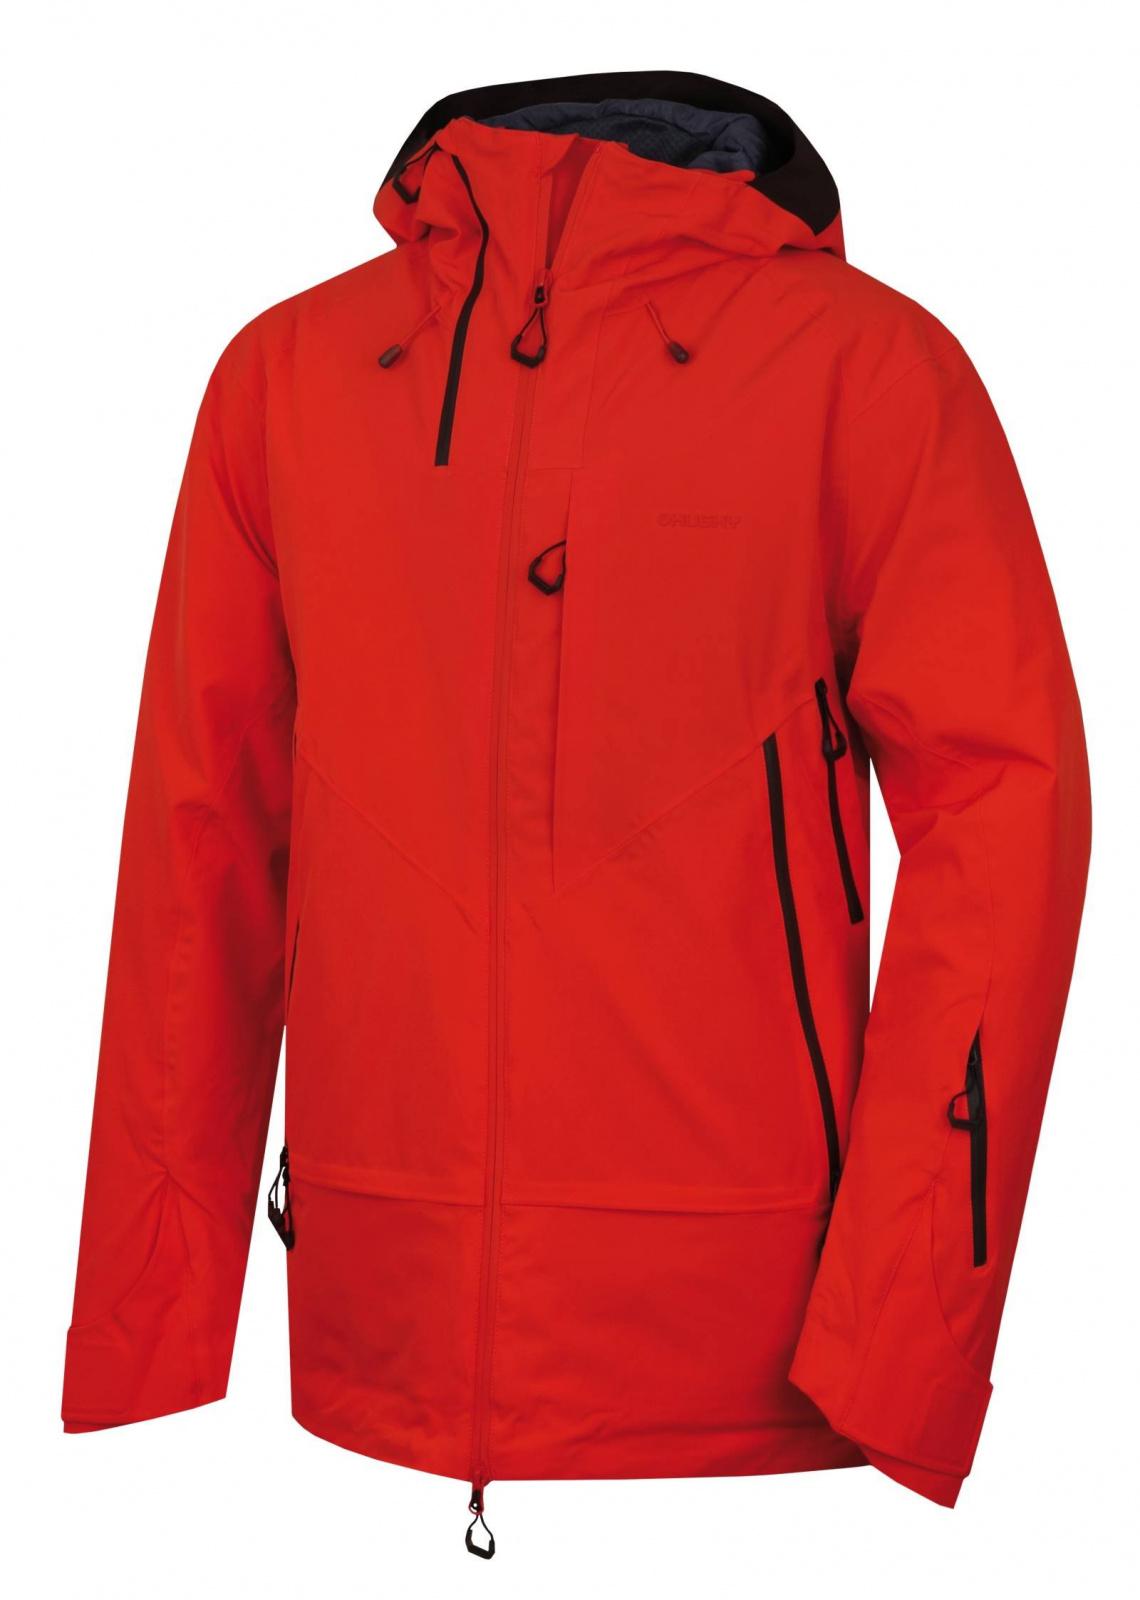 Husky Gambola M výrazne červená, XXL Pánska hardshell bunda